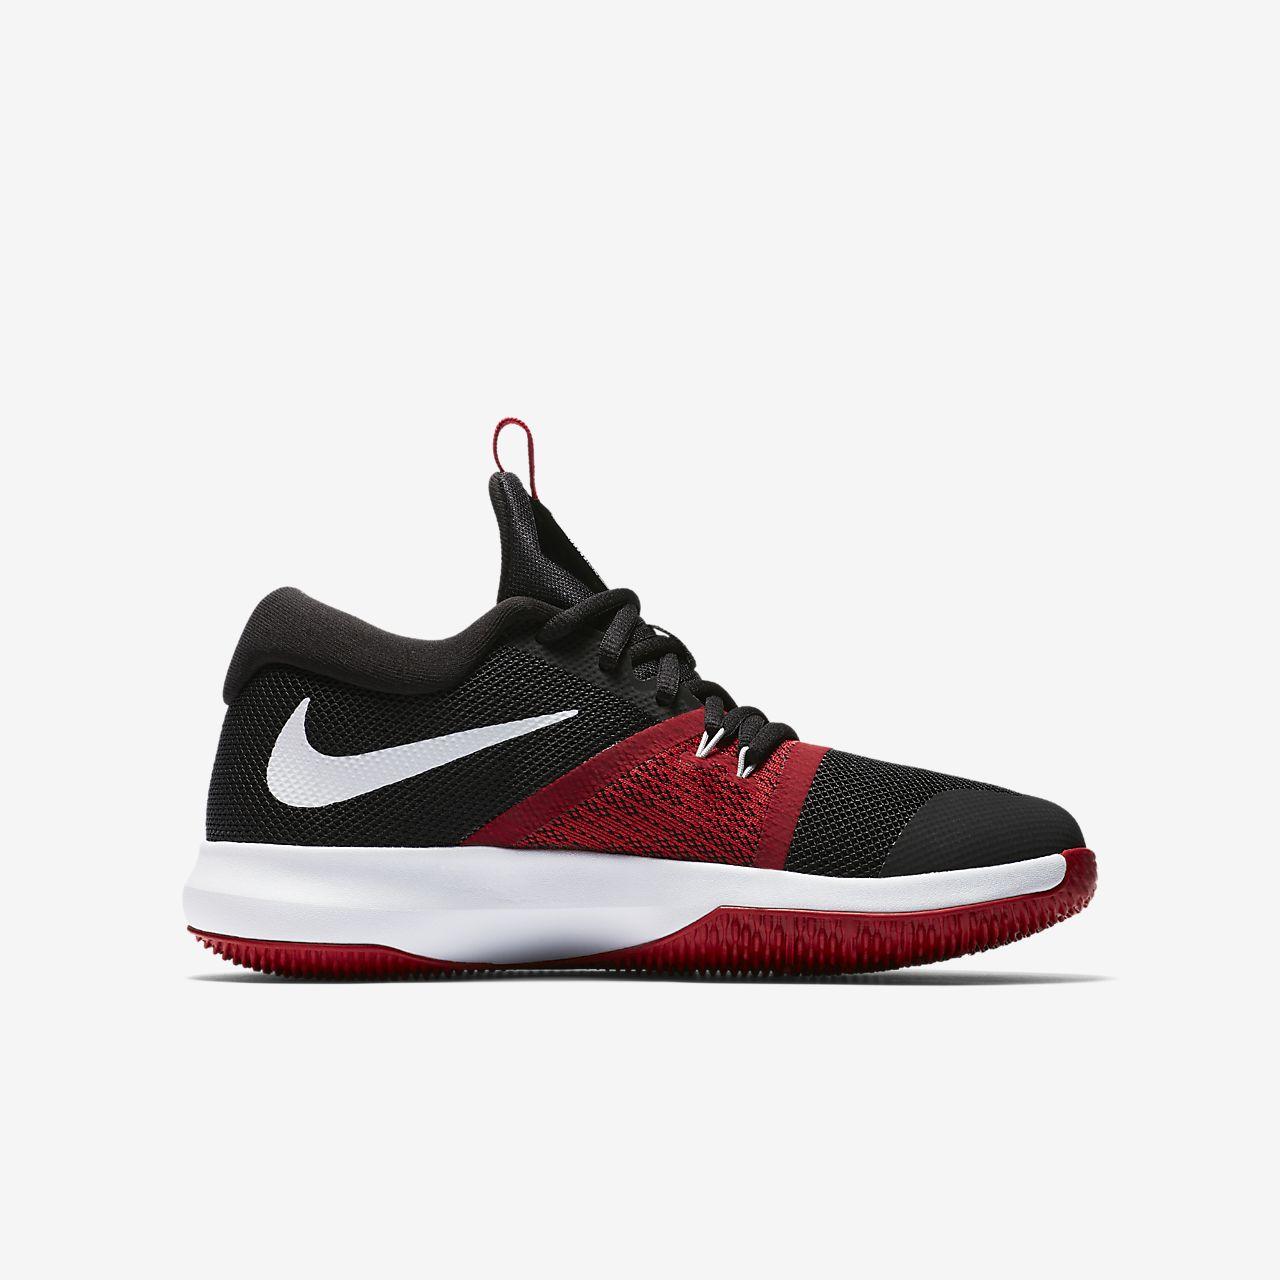 ... Nike Zoom Assersion Older Kids' Basketball Shoe